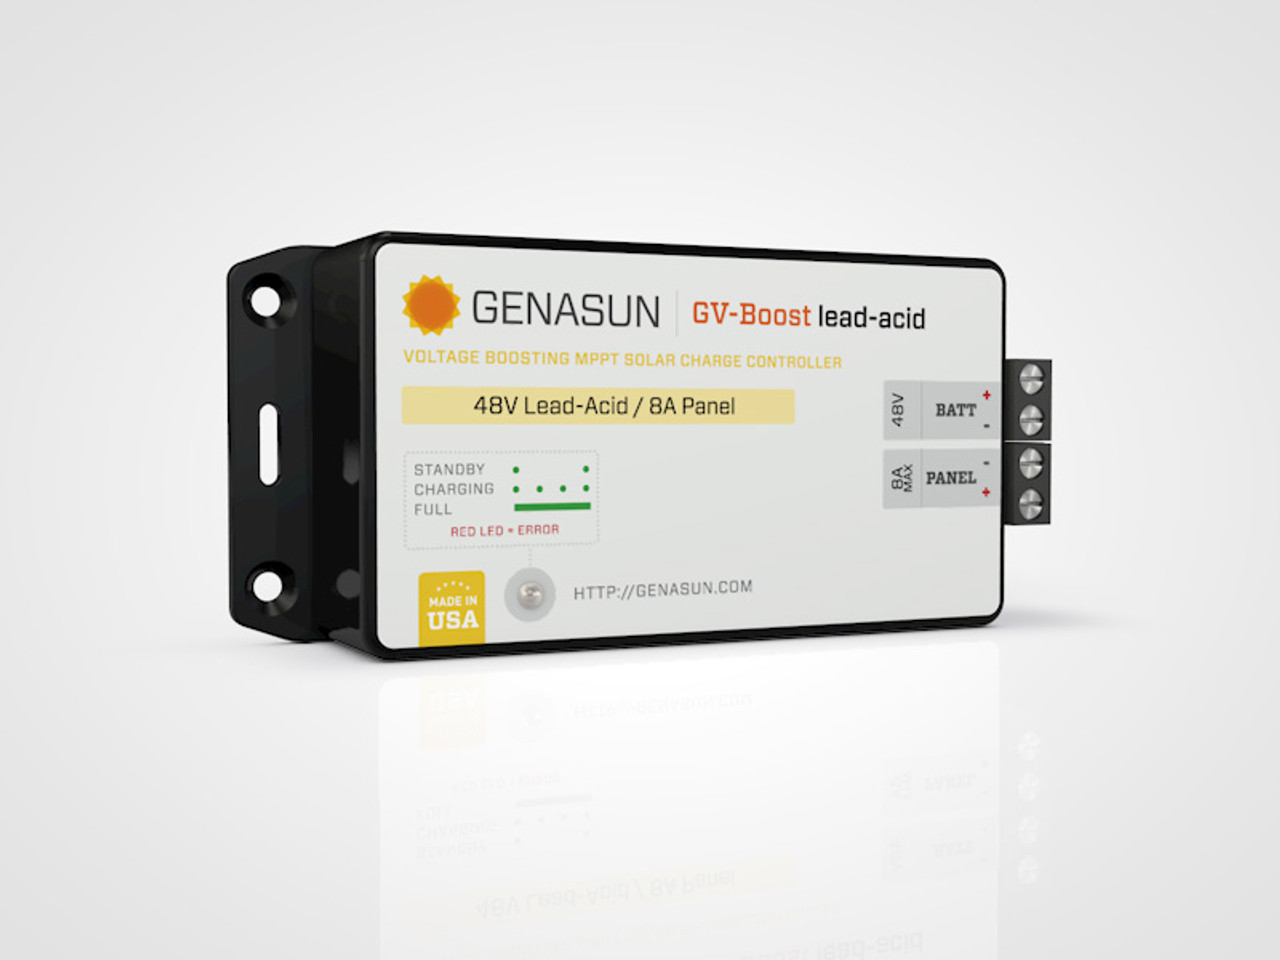 GVB-8   105W 8A 12V Genasun MPPT Boost Solar Charge Controller - Pb - Left1